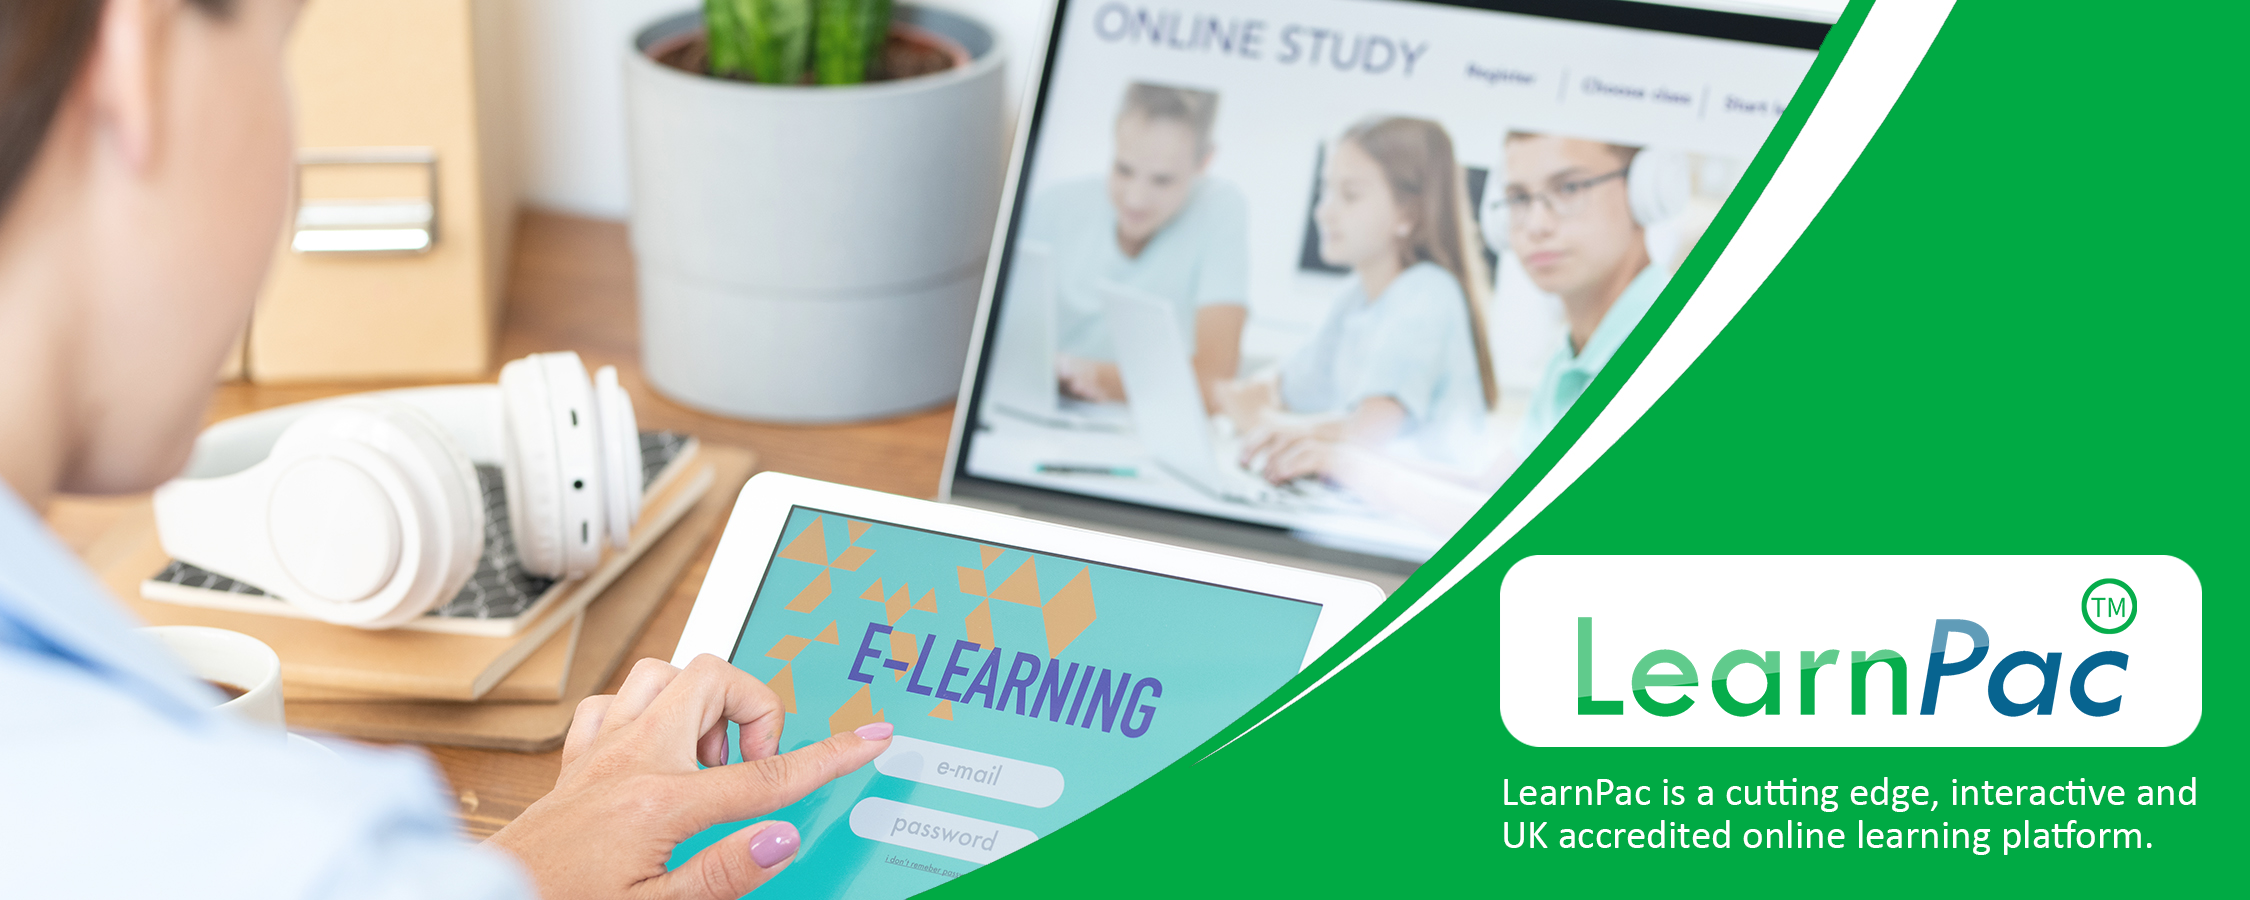 Professional Boundaries in Health and Care - Online Learning Courses - E-Learning Courses - LearnPac Systems UK -